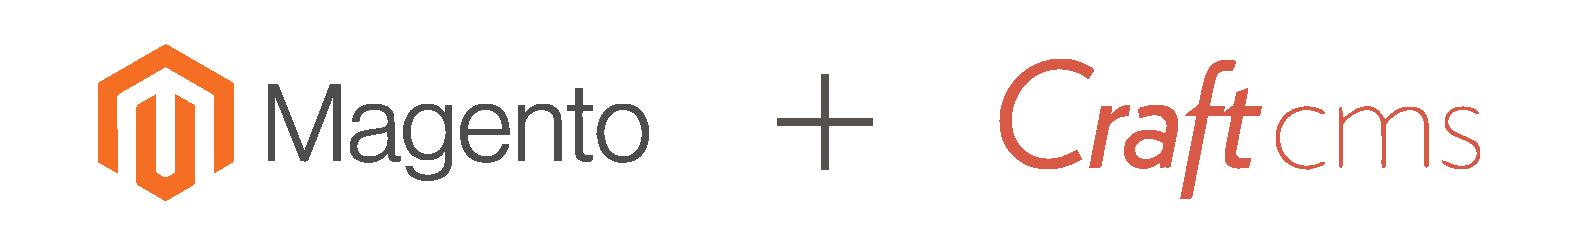 Using Magento and Craft together Logo